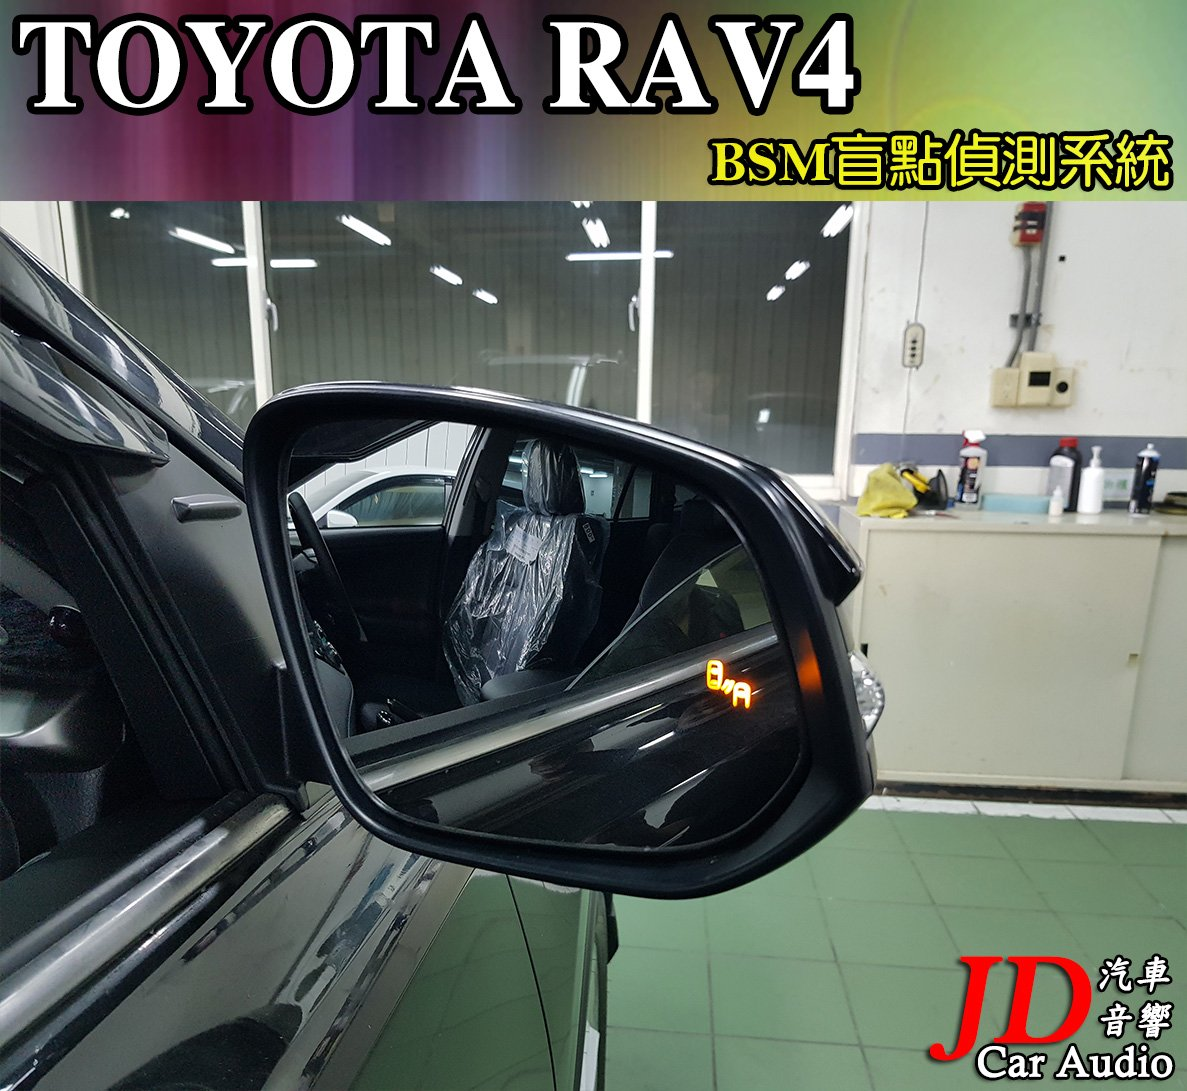 【JD汽車音響】實裝車 TOYOTA RAV4 BSM盲點偵測系統 盲區偵測系統 車側警示 NCC國家認證 免鑽洞。豐田